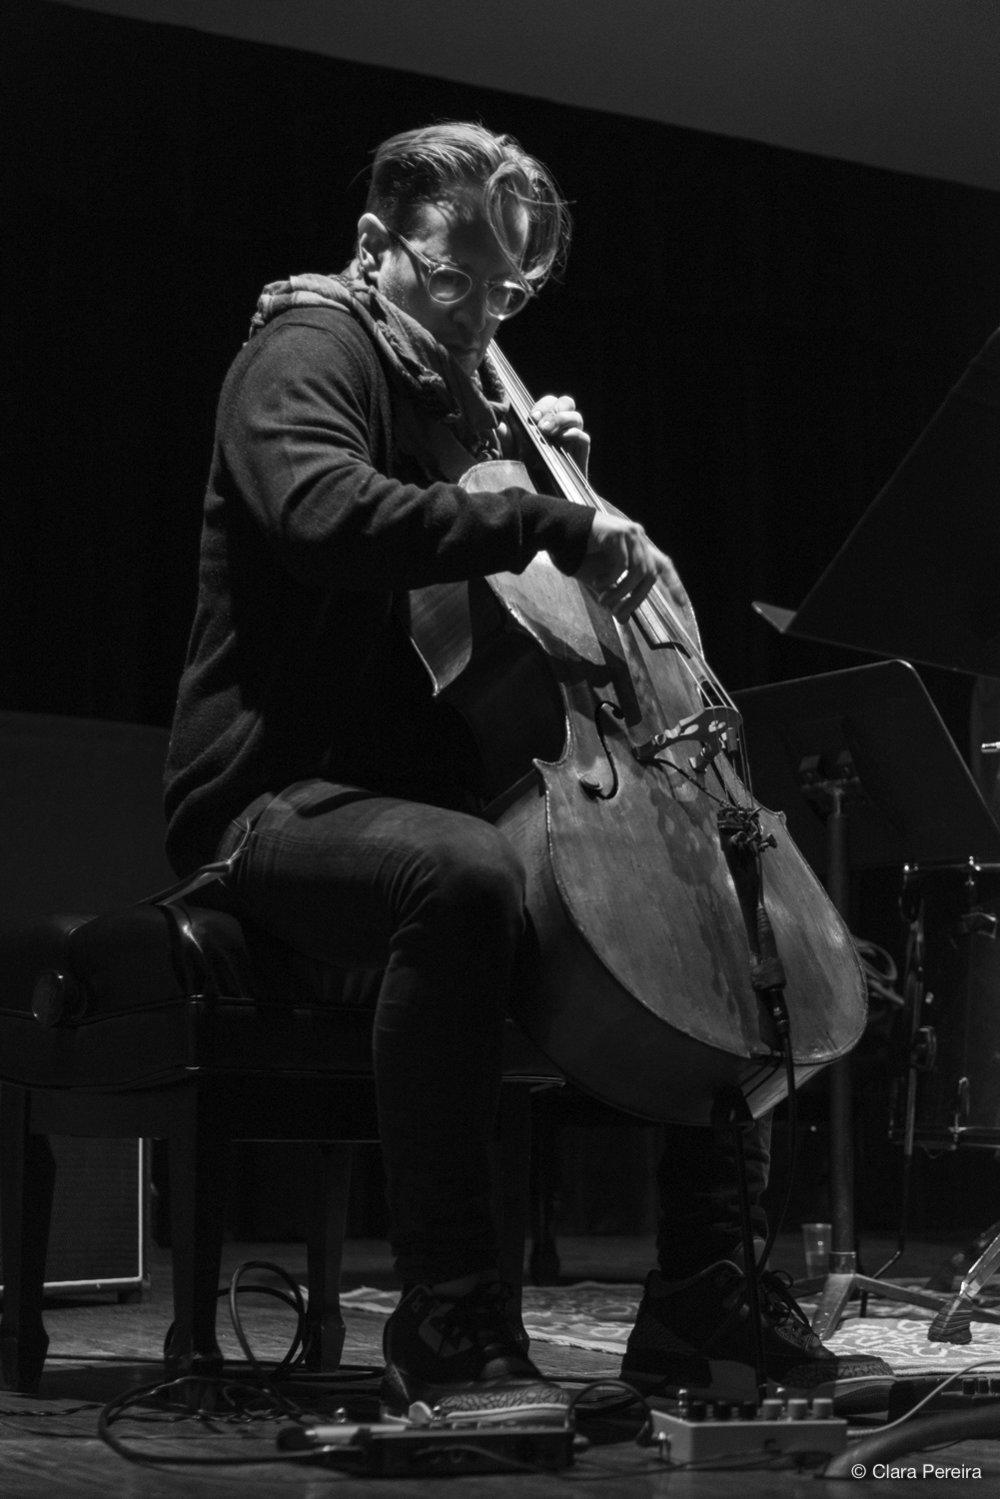 Chris Hoffman, 2018